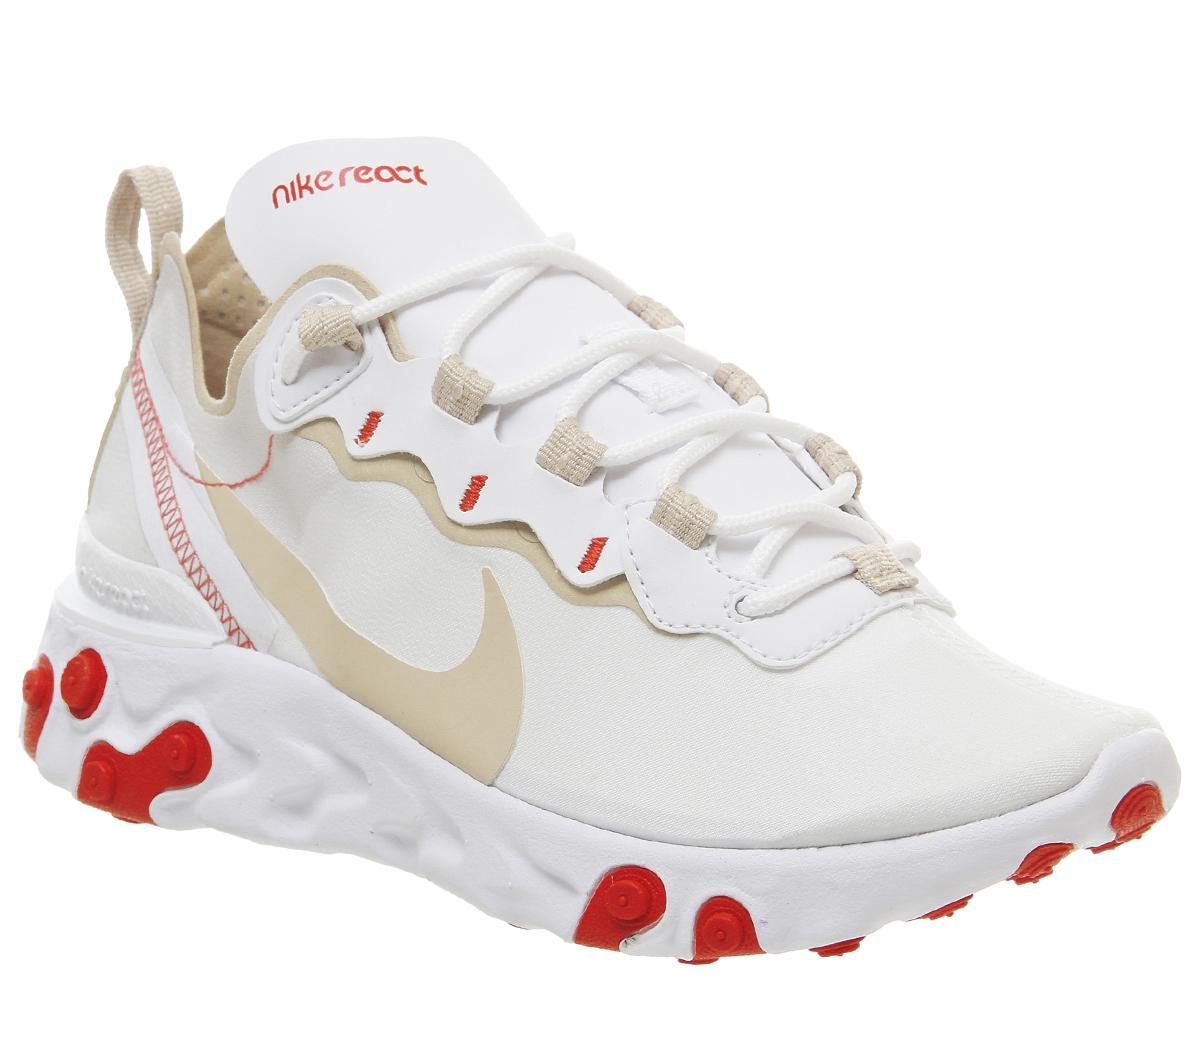 Nike React Element 55 Trainers White